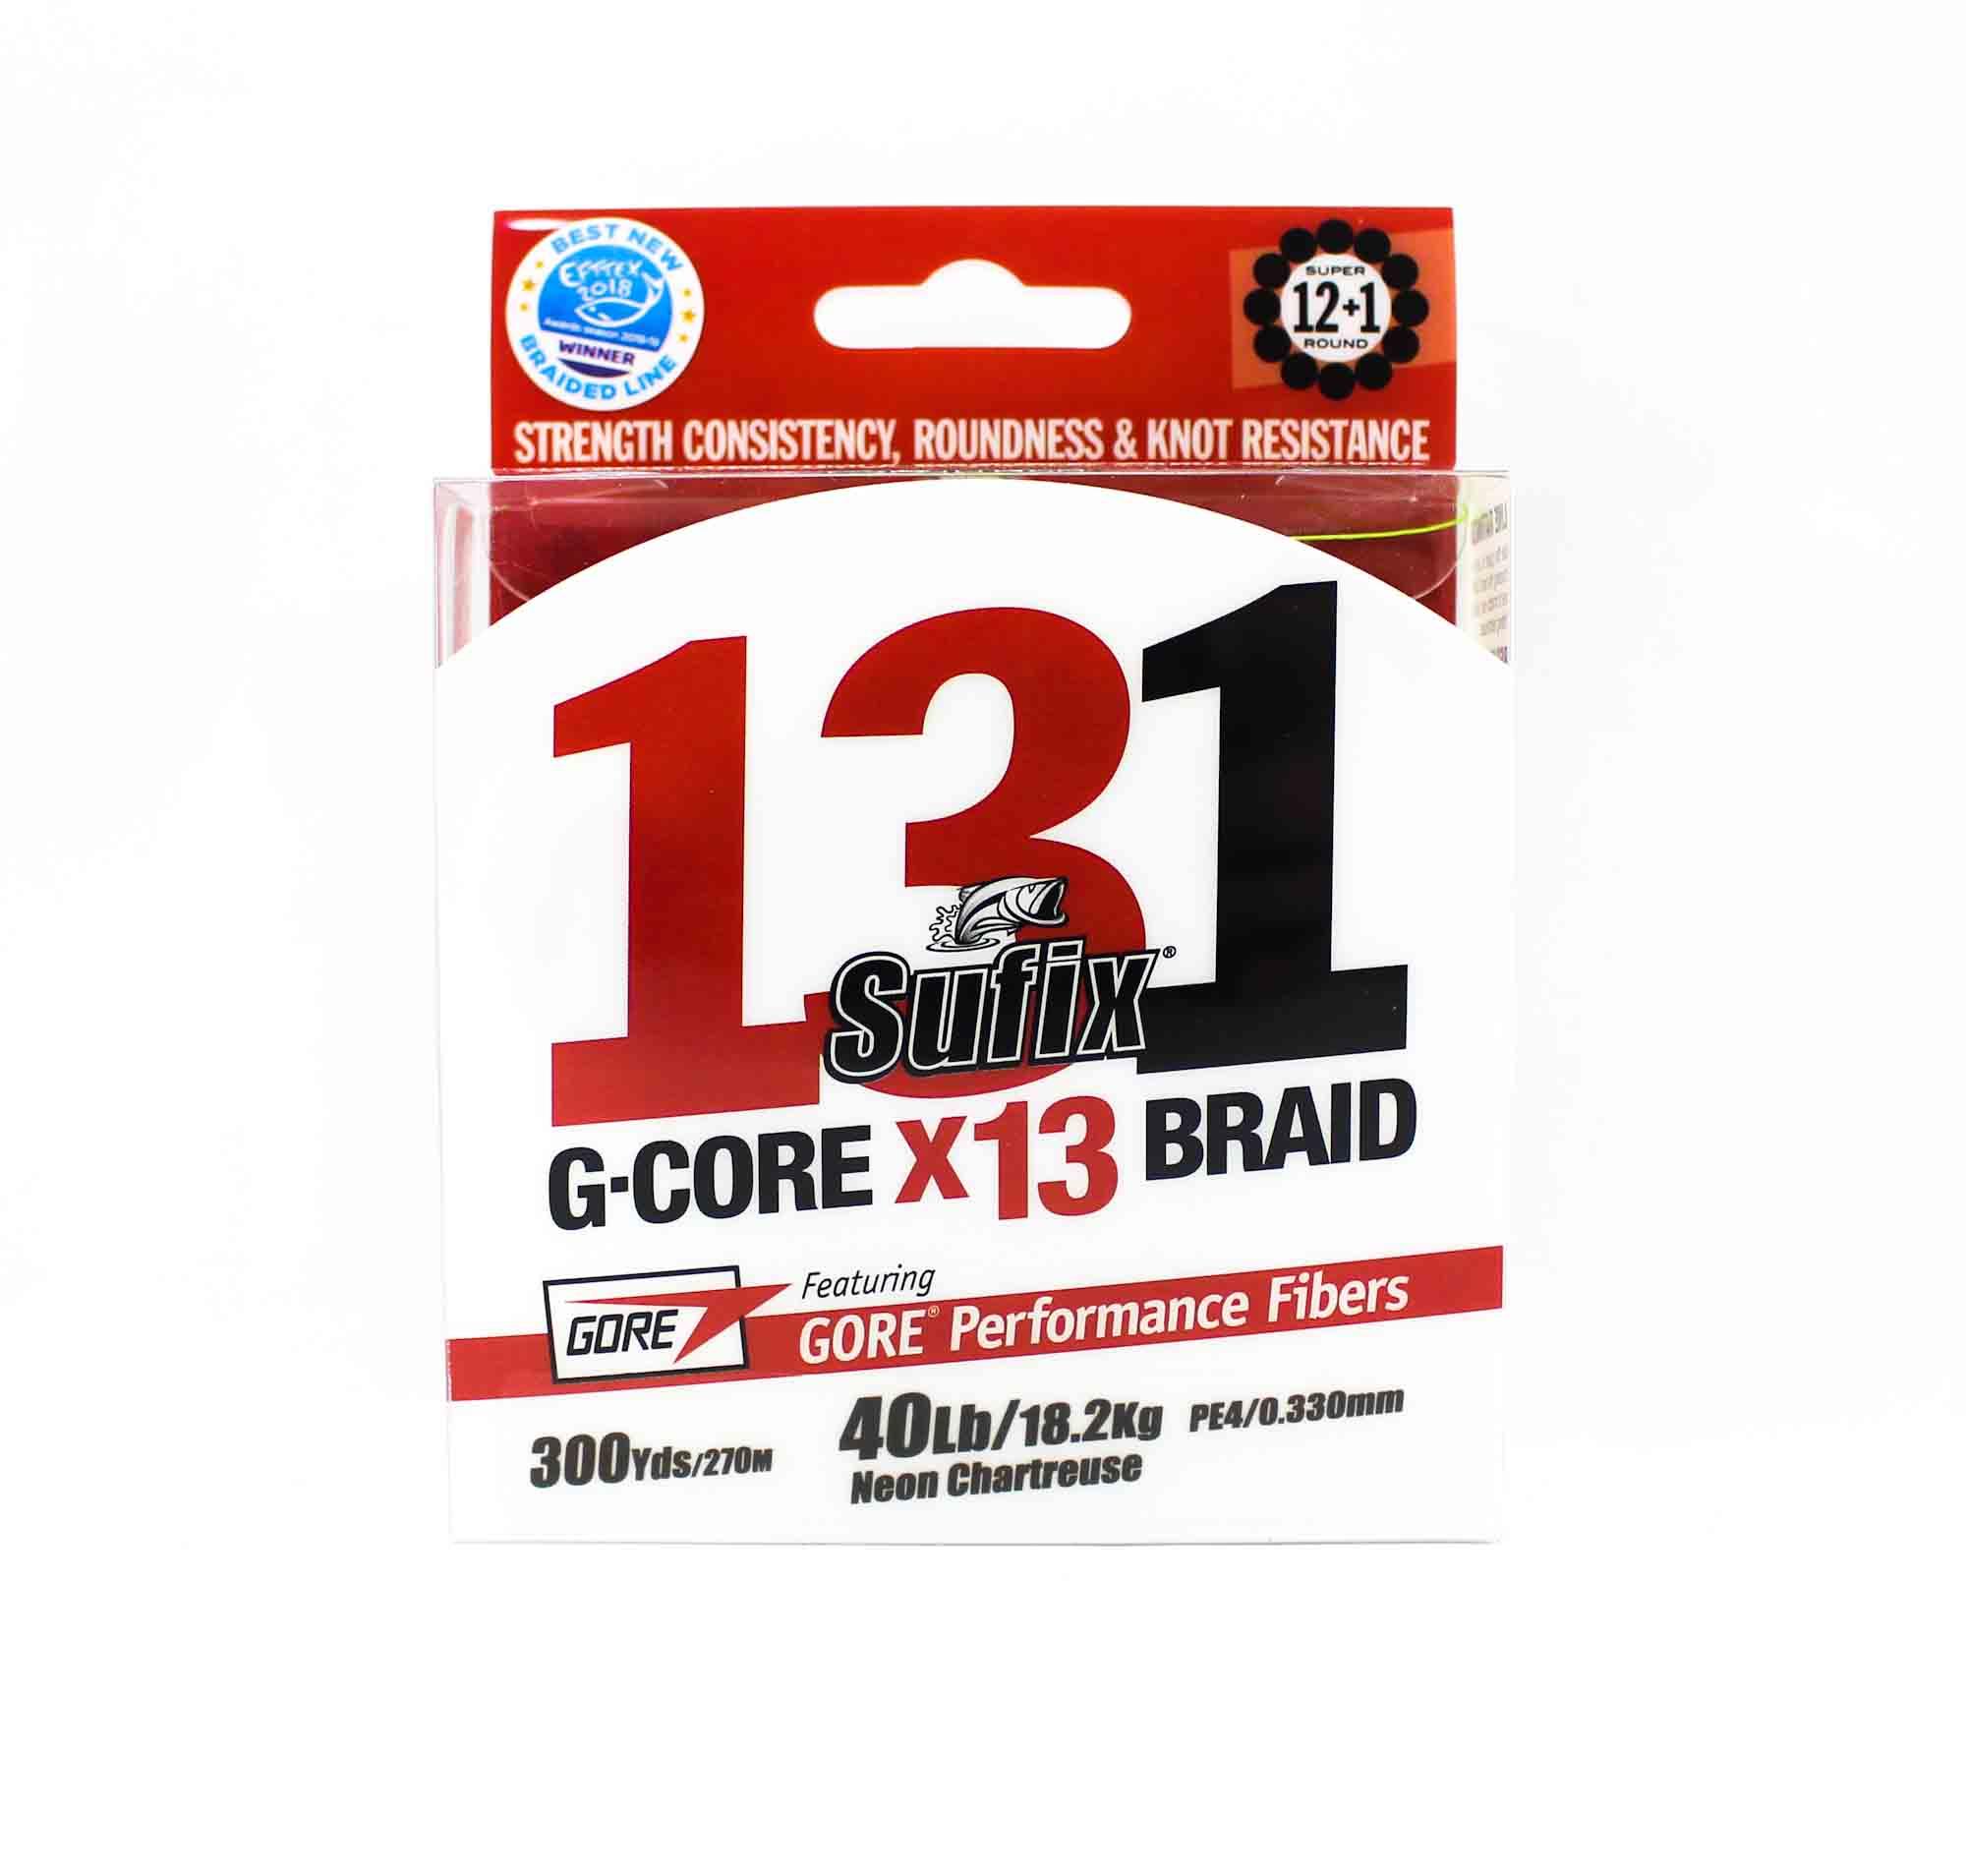 Sufix Braided 131 G-Core X13 Line 300yds 40lb Neon Chart (4045)